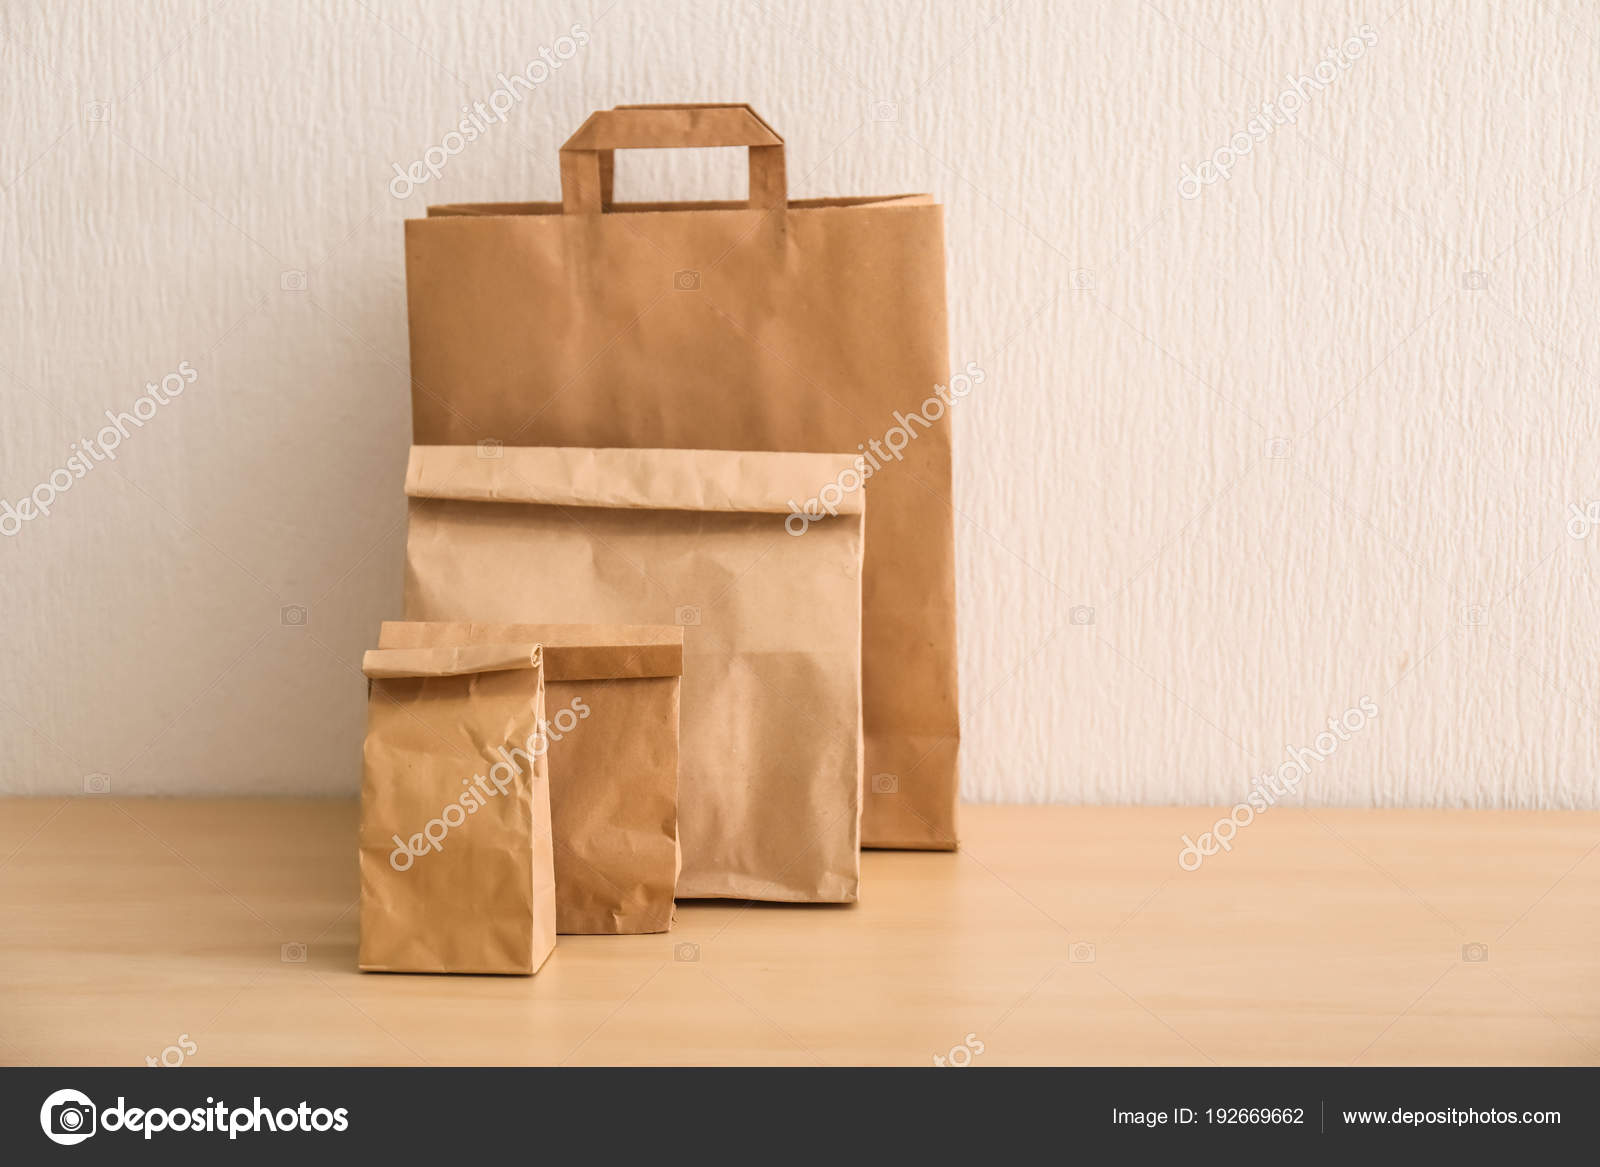 1c614a29c0 Διαφορετικό χαρτί τσάντες στο φως τραπέζι. Υπηρεσία παράδοσης τροφίμων–  εικόνα αρχείου